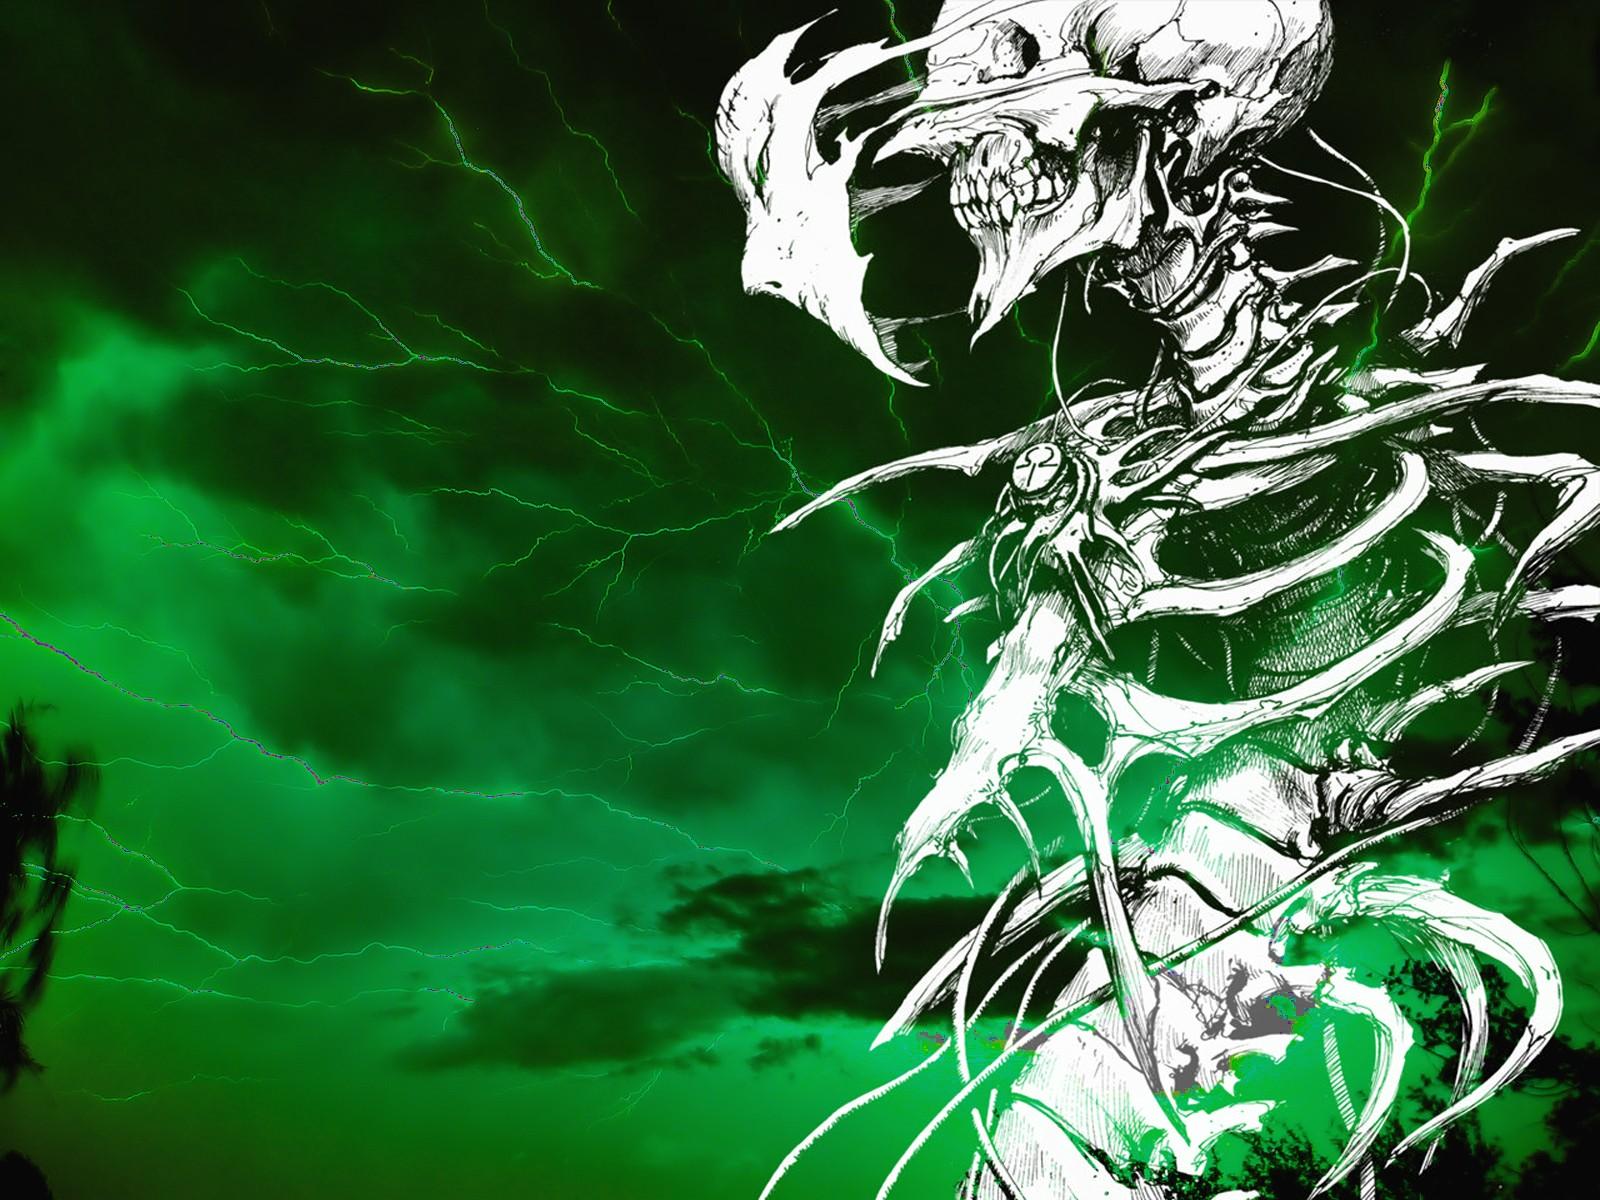 Peacetablet Backgrounds, Spooky,dark, Creepy, Skull, - Tsutomu Nihei Biomega - HD Wallpaper